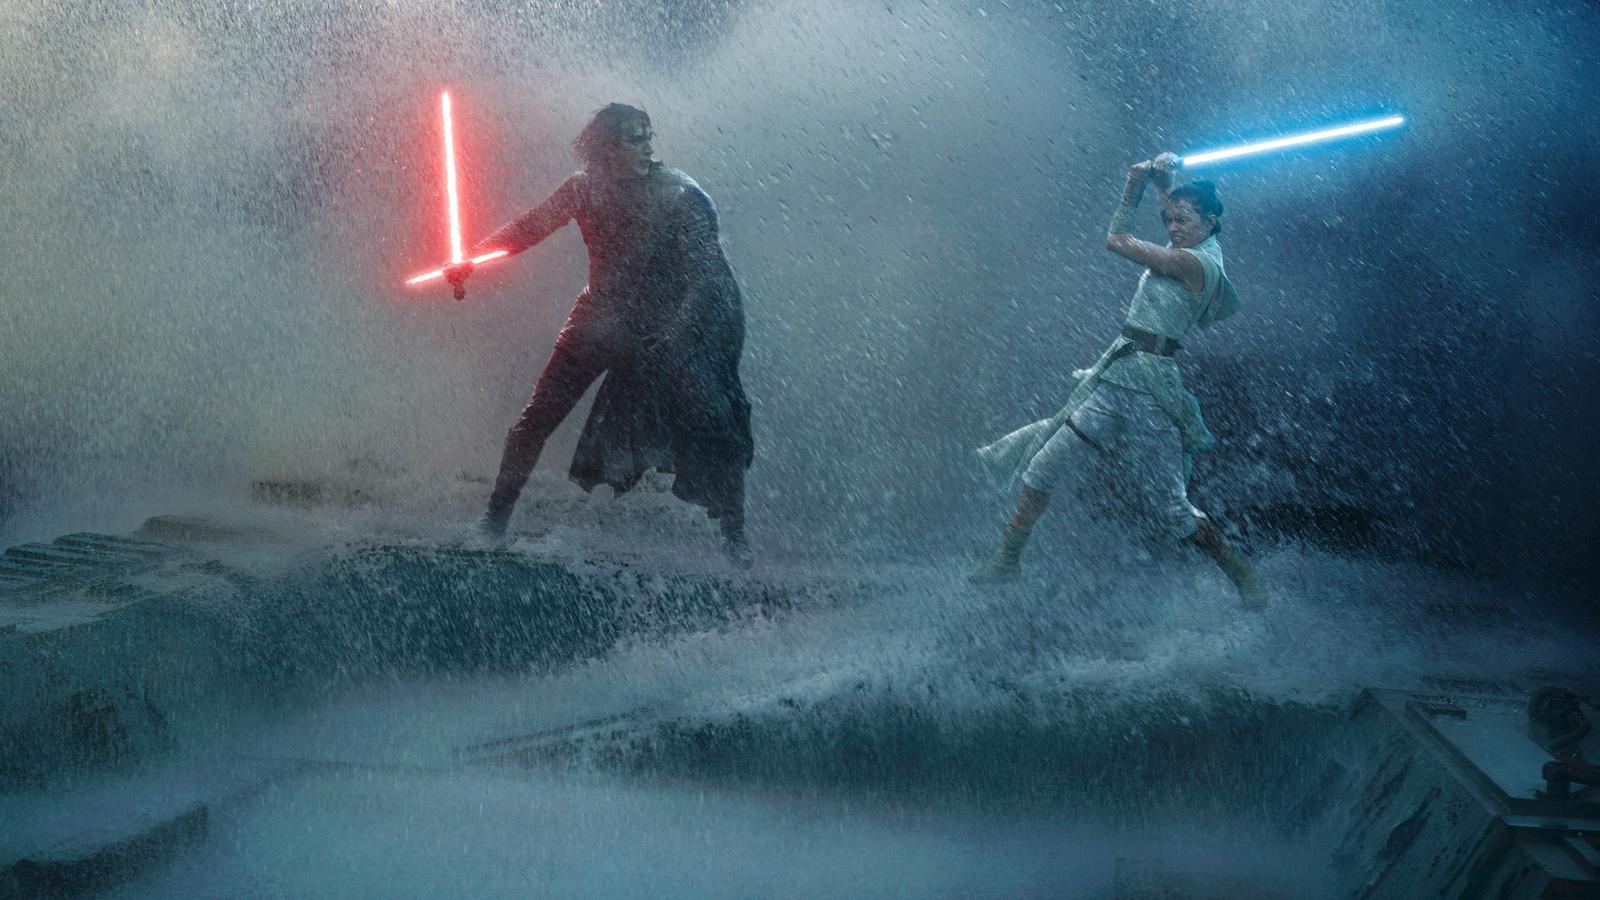 rey-vs-kylo-ren-star-wars-the-rise-of-skywalker-05.jpg